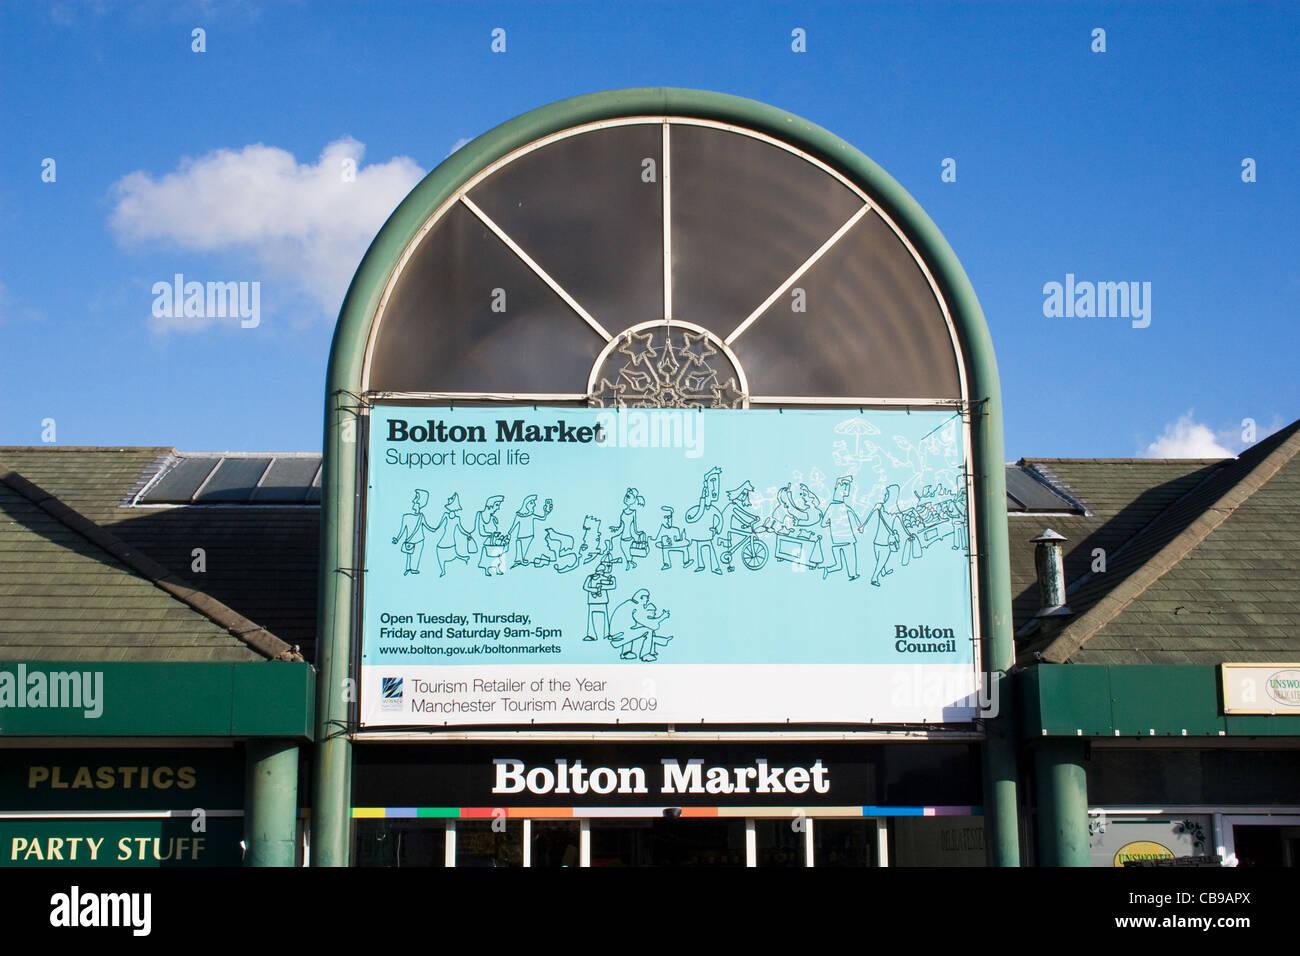 Bolton Market, Bolton, Greater Manchester, England, UK - Stock Image